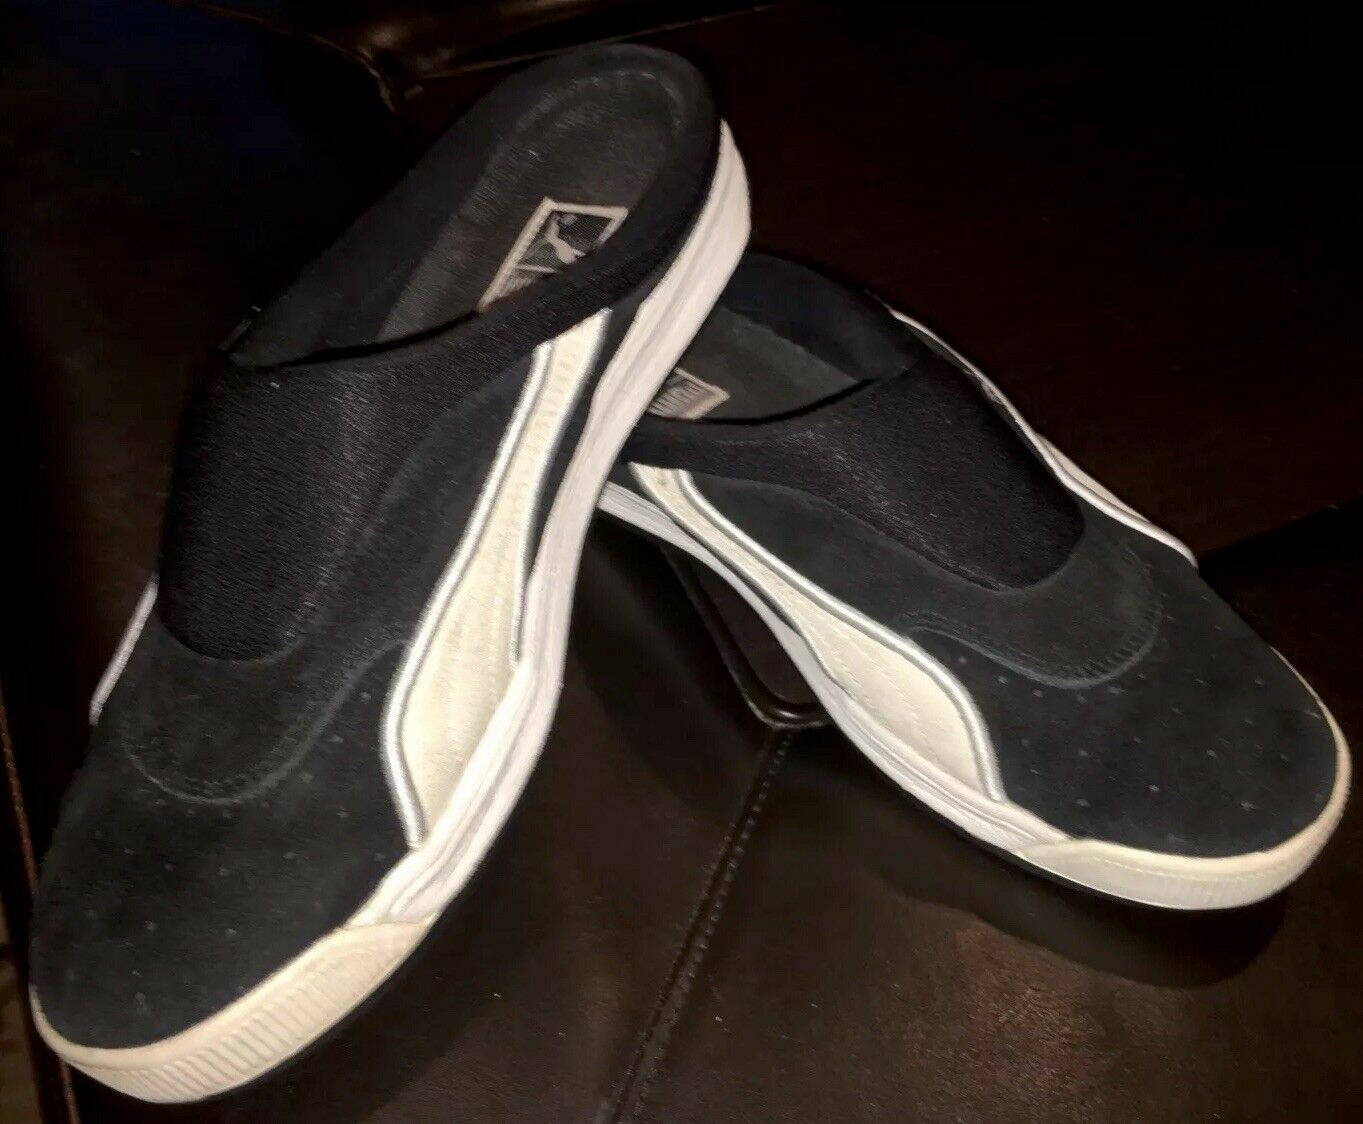 Puma Clyde Slides Sandals Rare Vintage Black Size 10